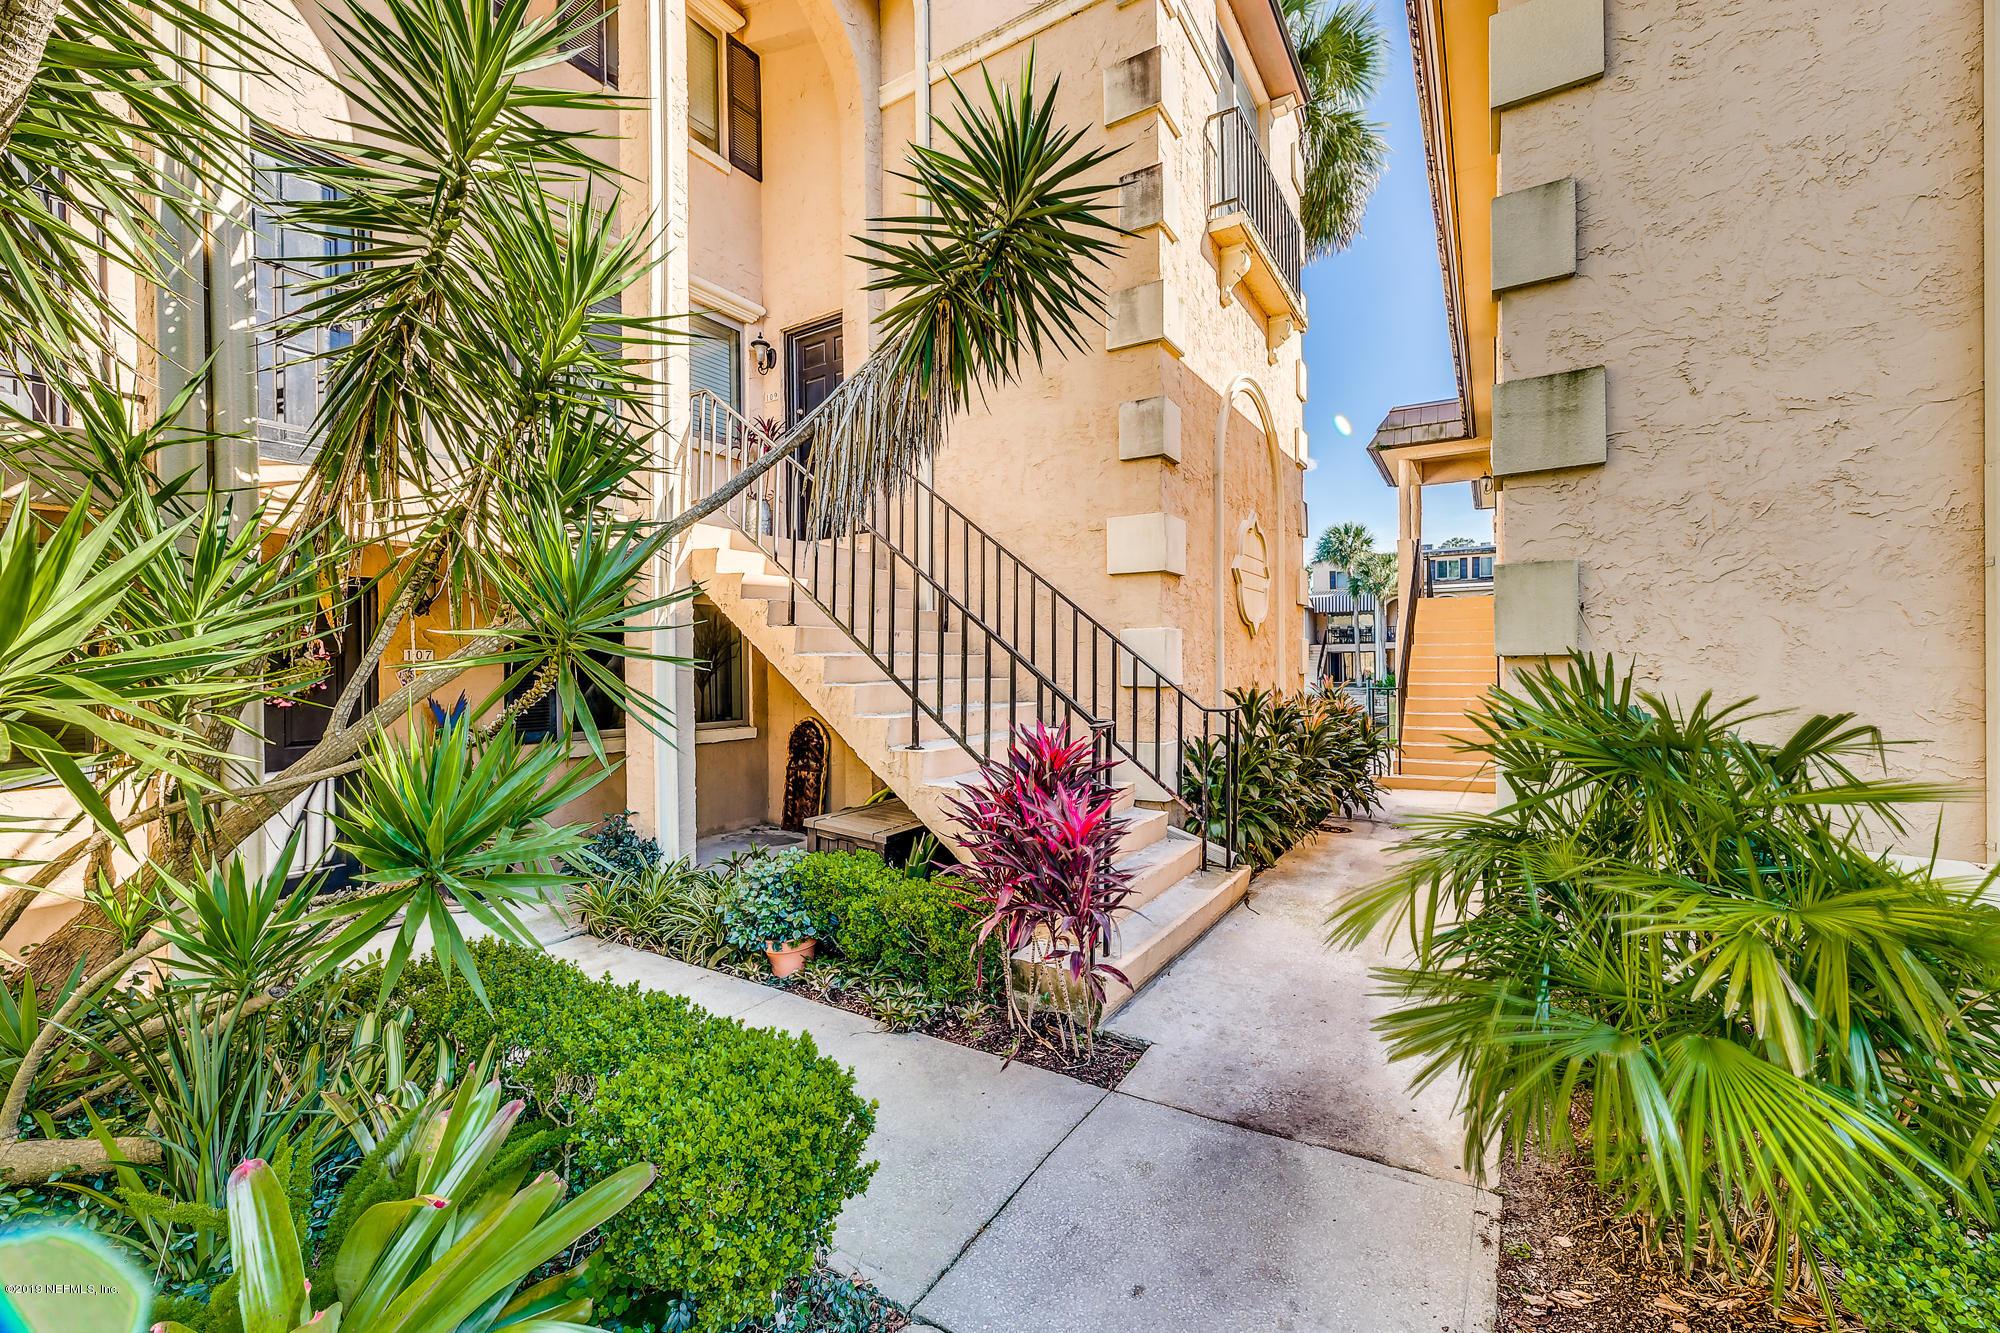 5375 ORTEGA FARMS, JACKSONVILLE, FLORIDA 32210, 2 Bedrooms Bedrooms, ,1 BathroomBathrooms,Residential - condos/townhomes,For sale,ORTEGA FARMS,985224